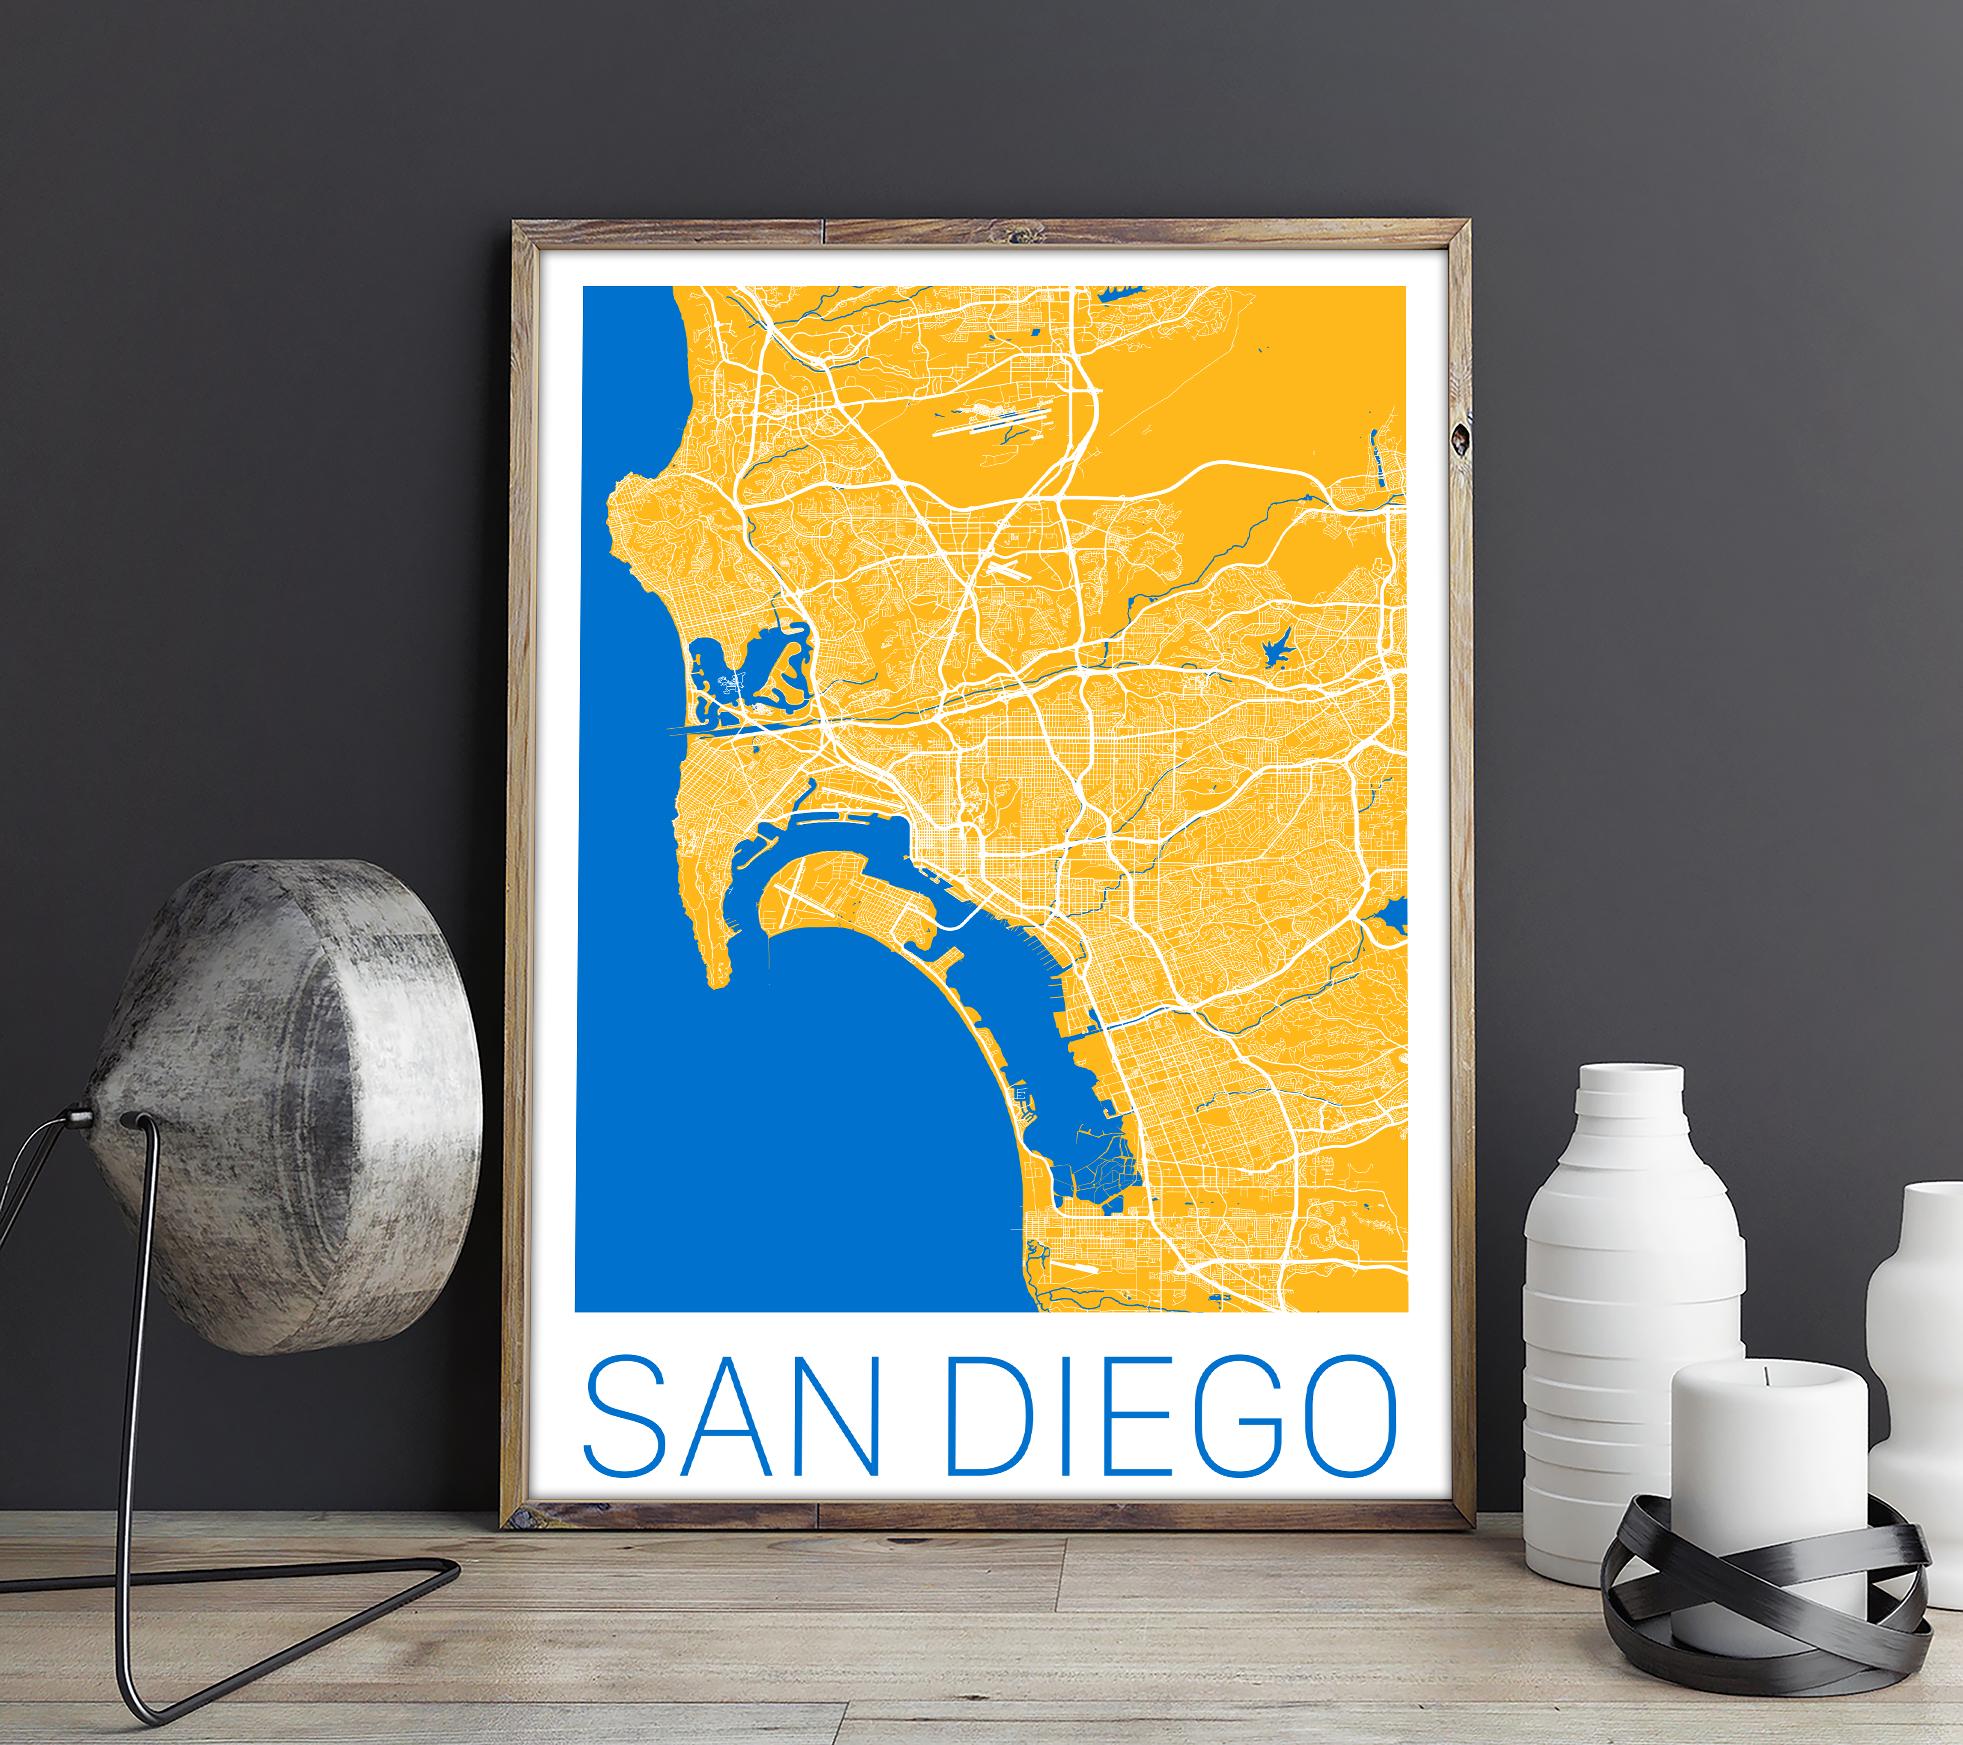 Fine Wall Art San Diego Illustration - Art & Wall Decor - hecatalog.info